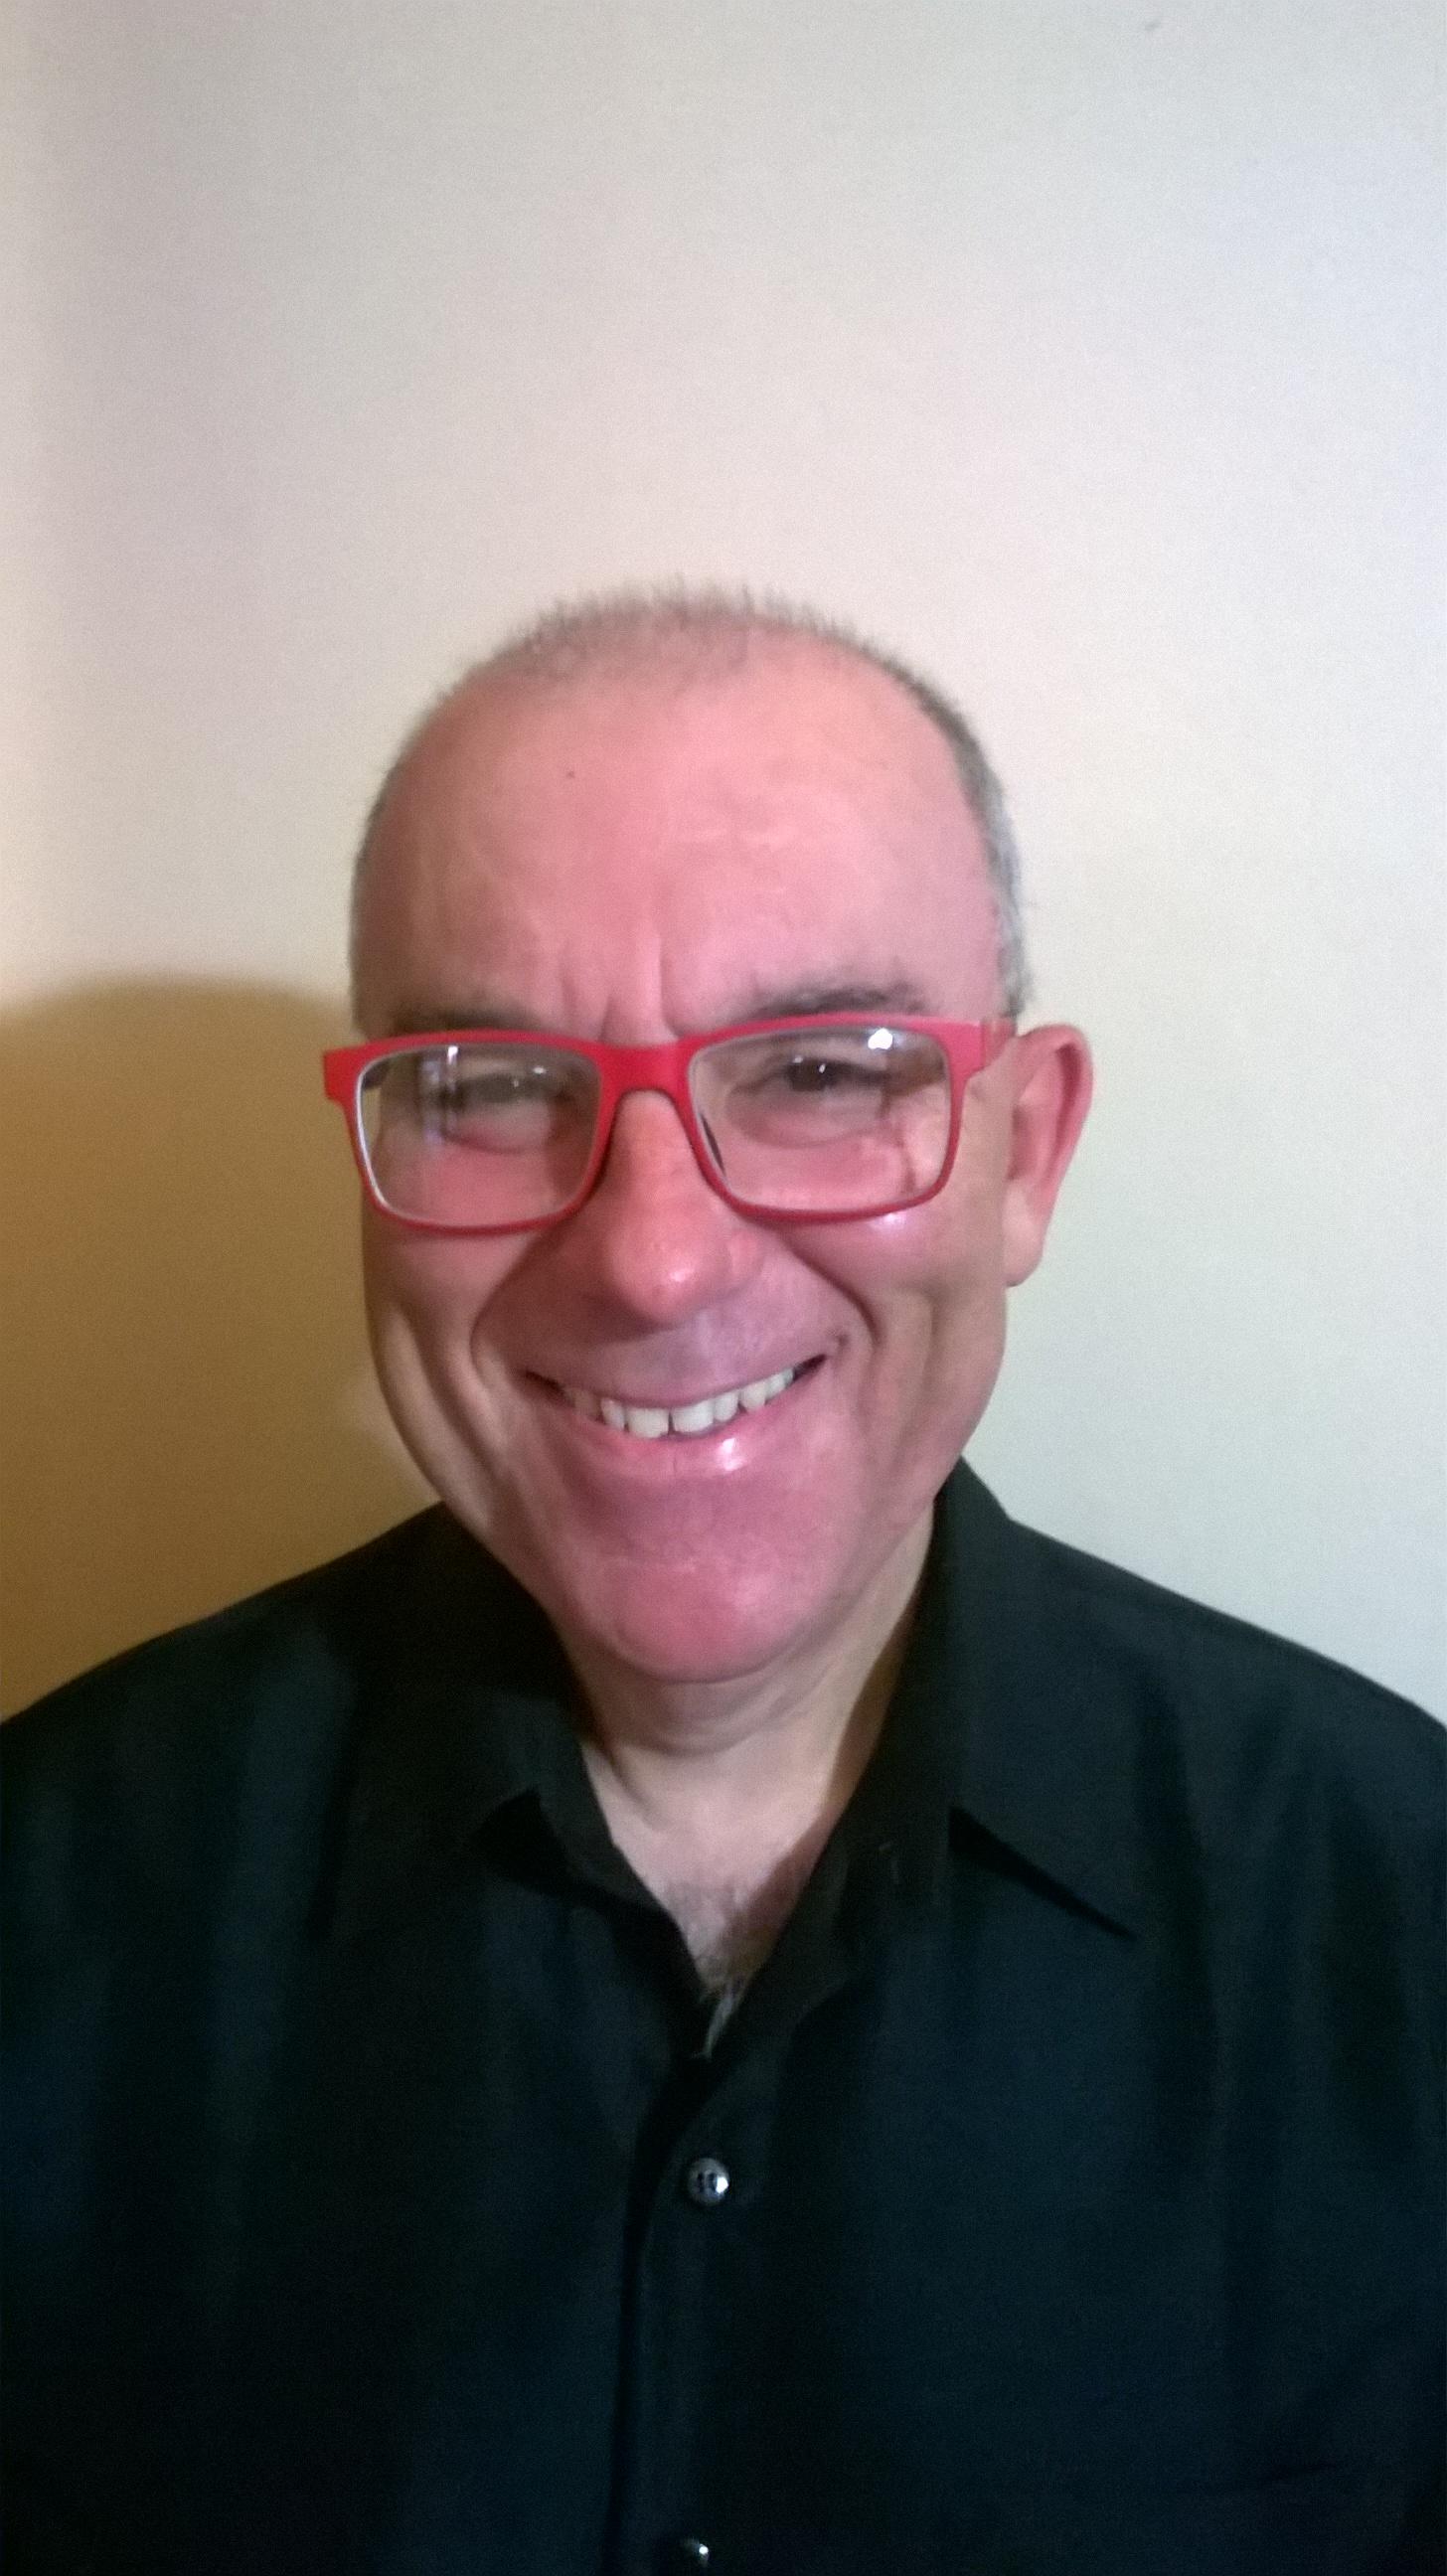 Luiz Soares